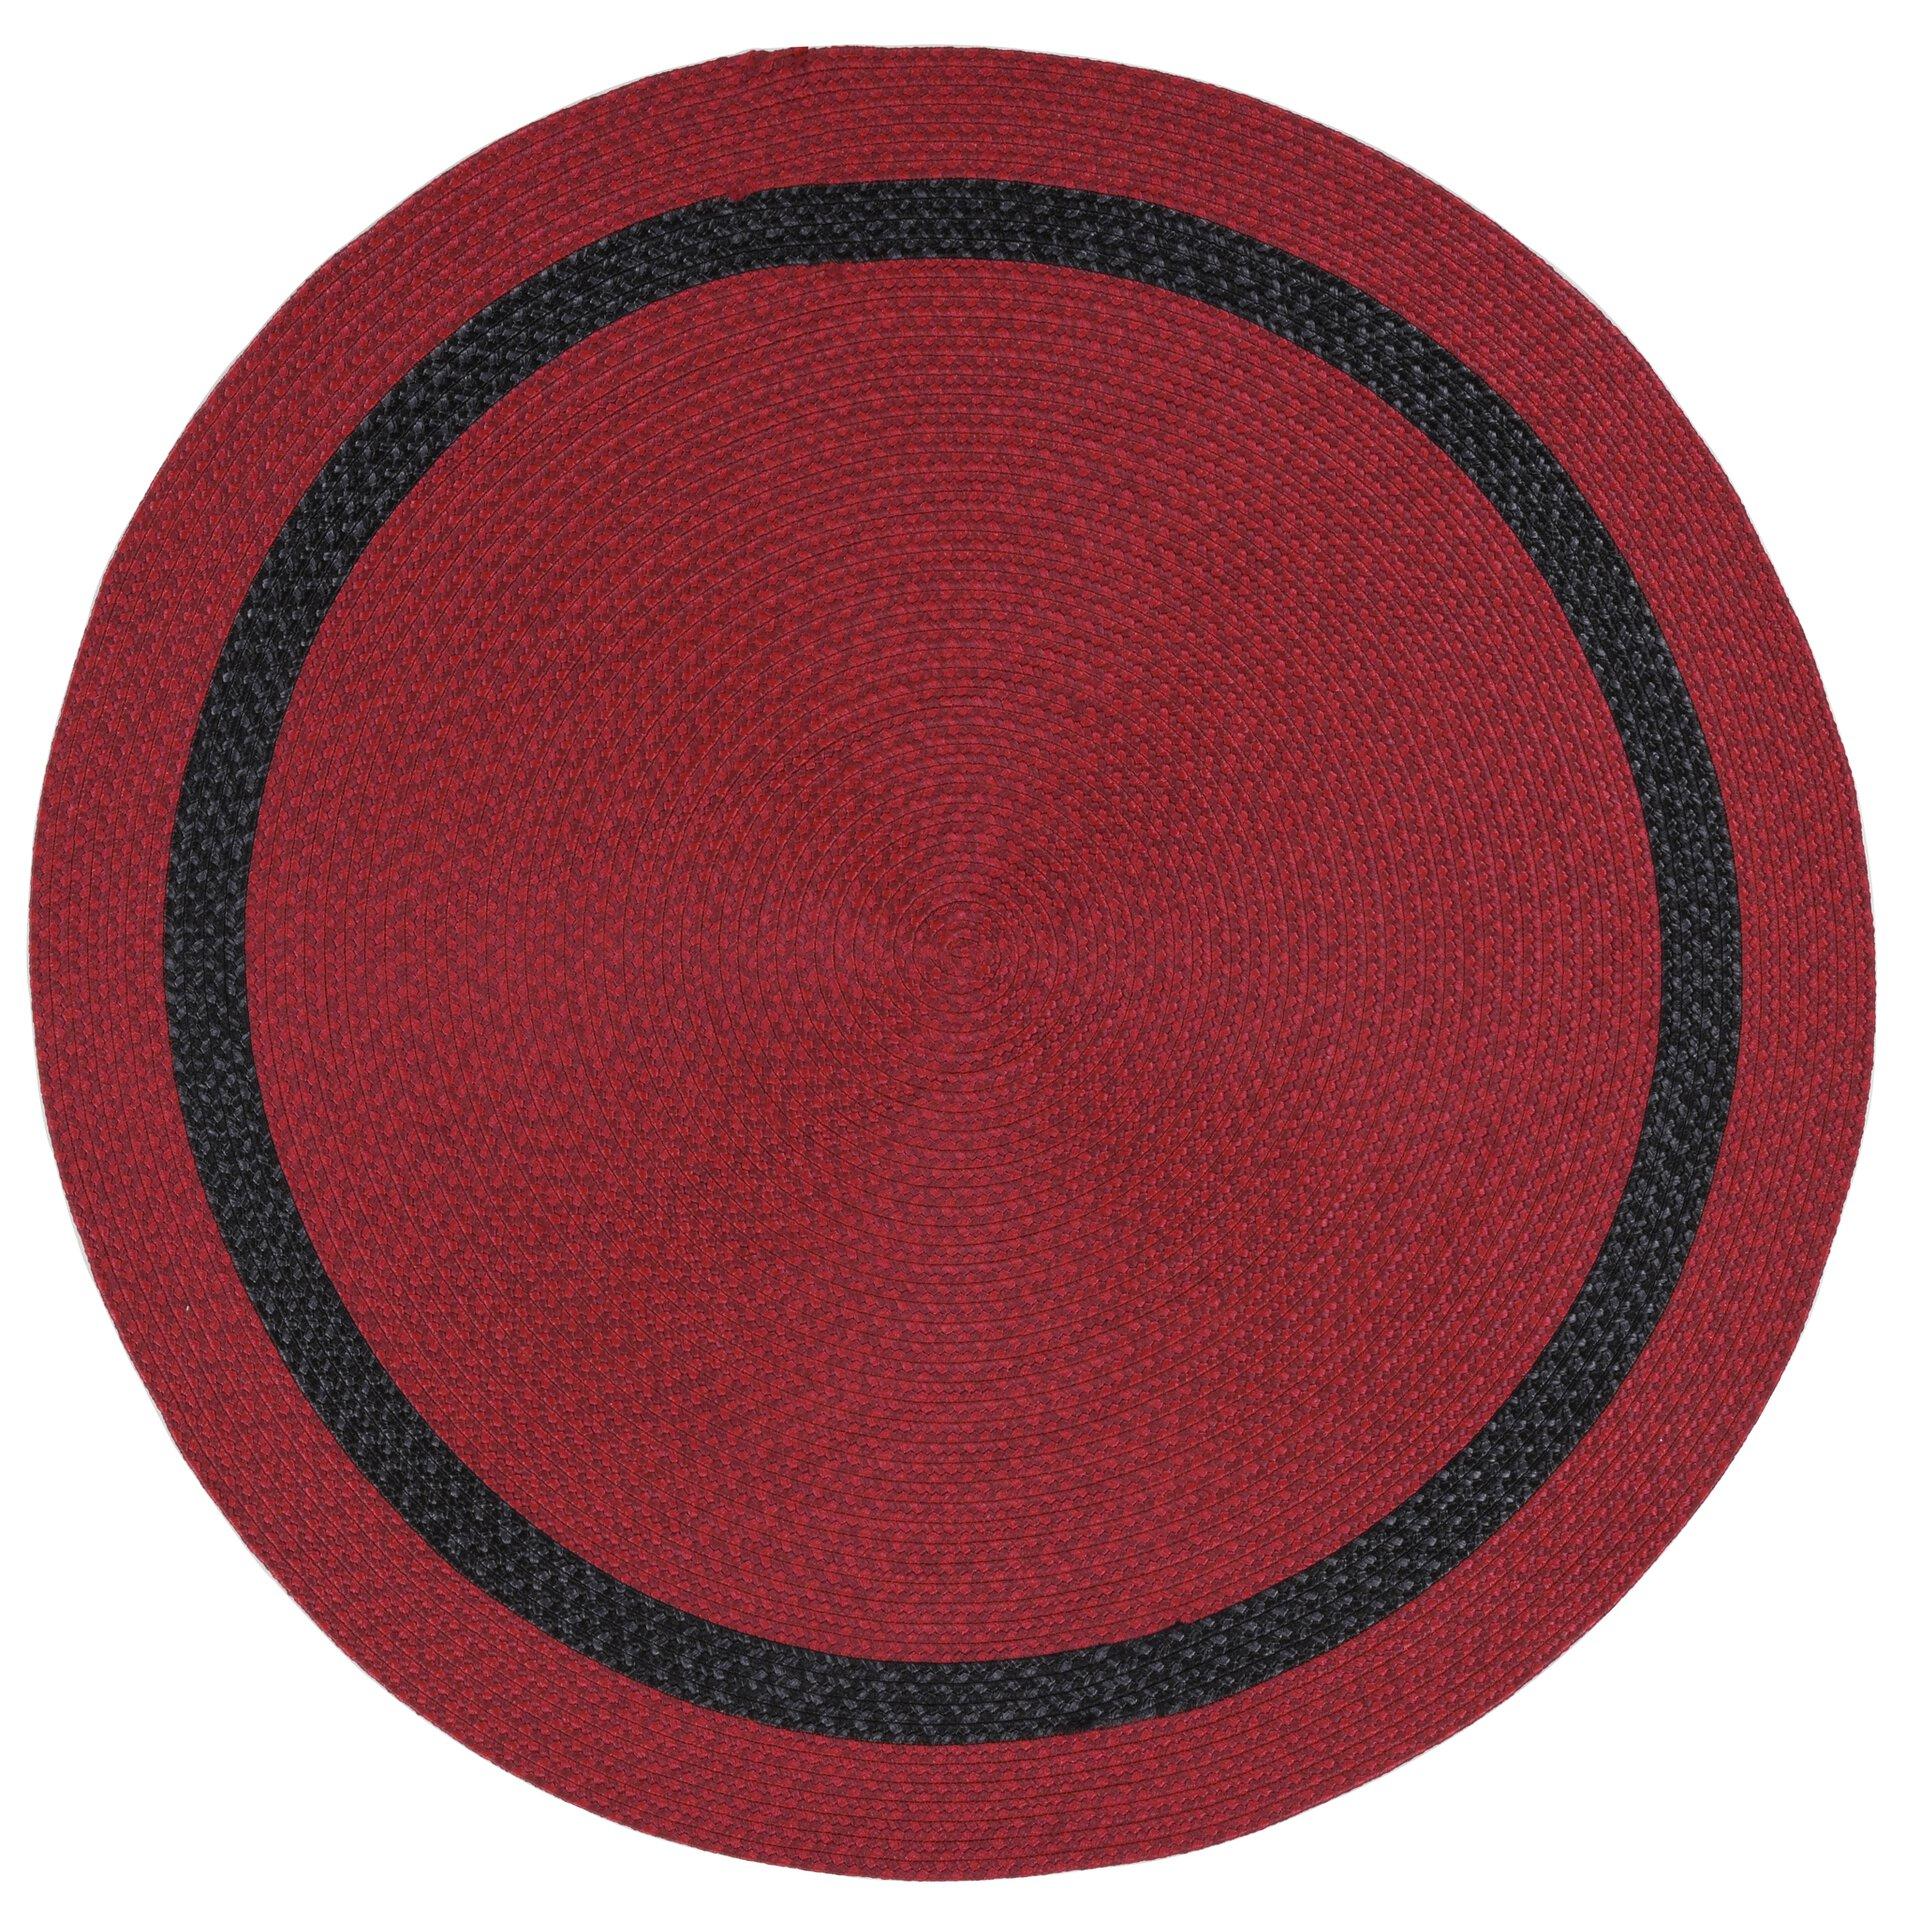 Handwebteppich Benito Gino Falcone Textil rot